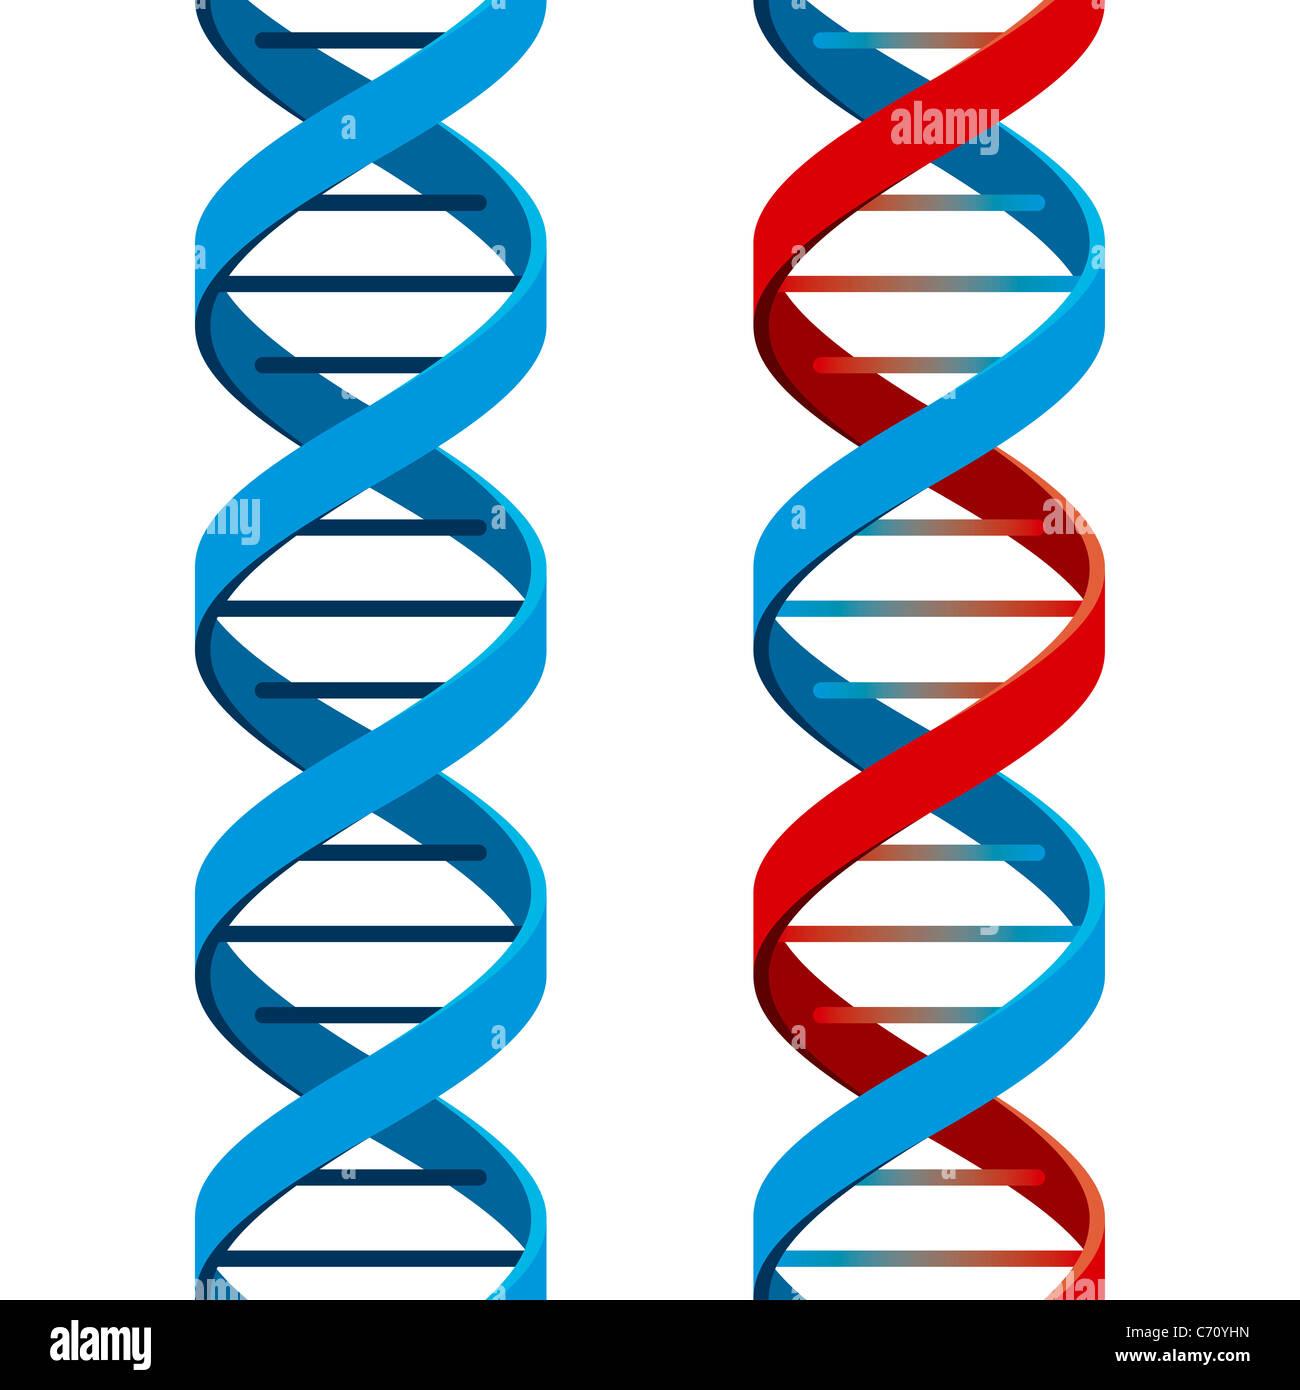 DNA Symbol - Stock Image